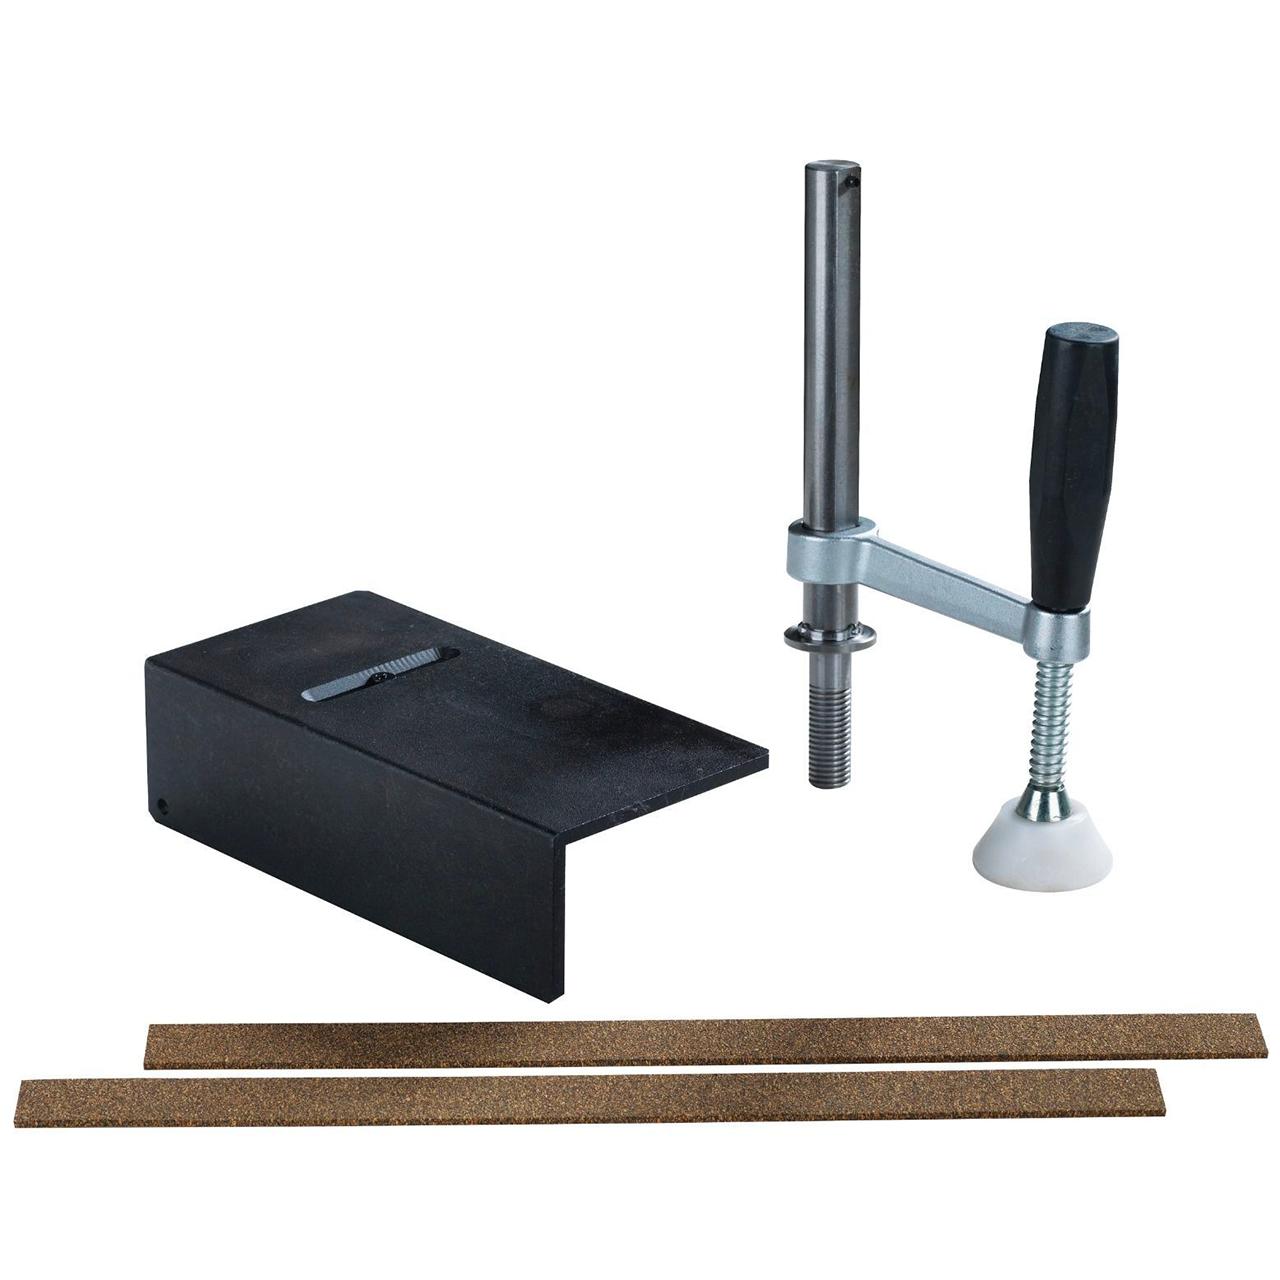 Sjobergs Nordic Pro 1400 Workbench + SM03 Cabinet + Accessories